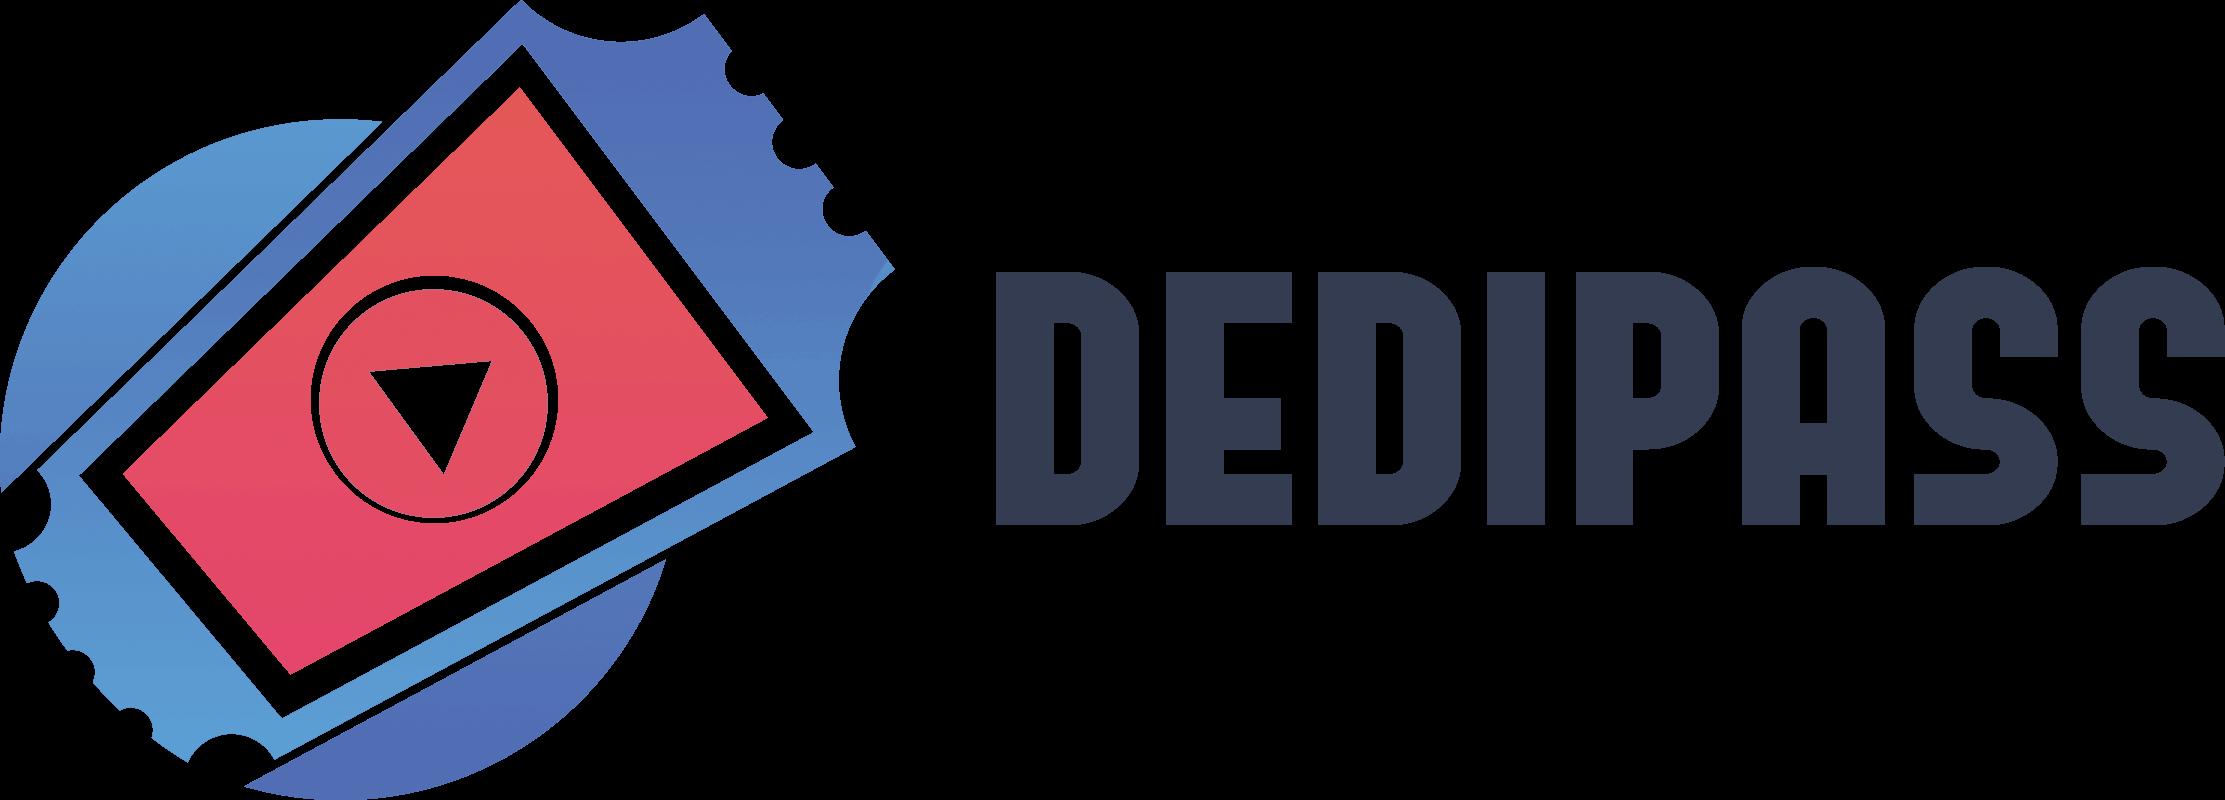 Logo Dedipass